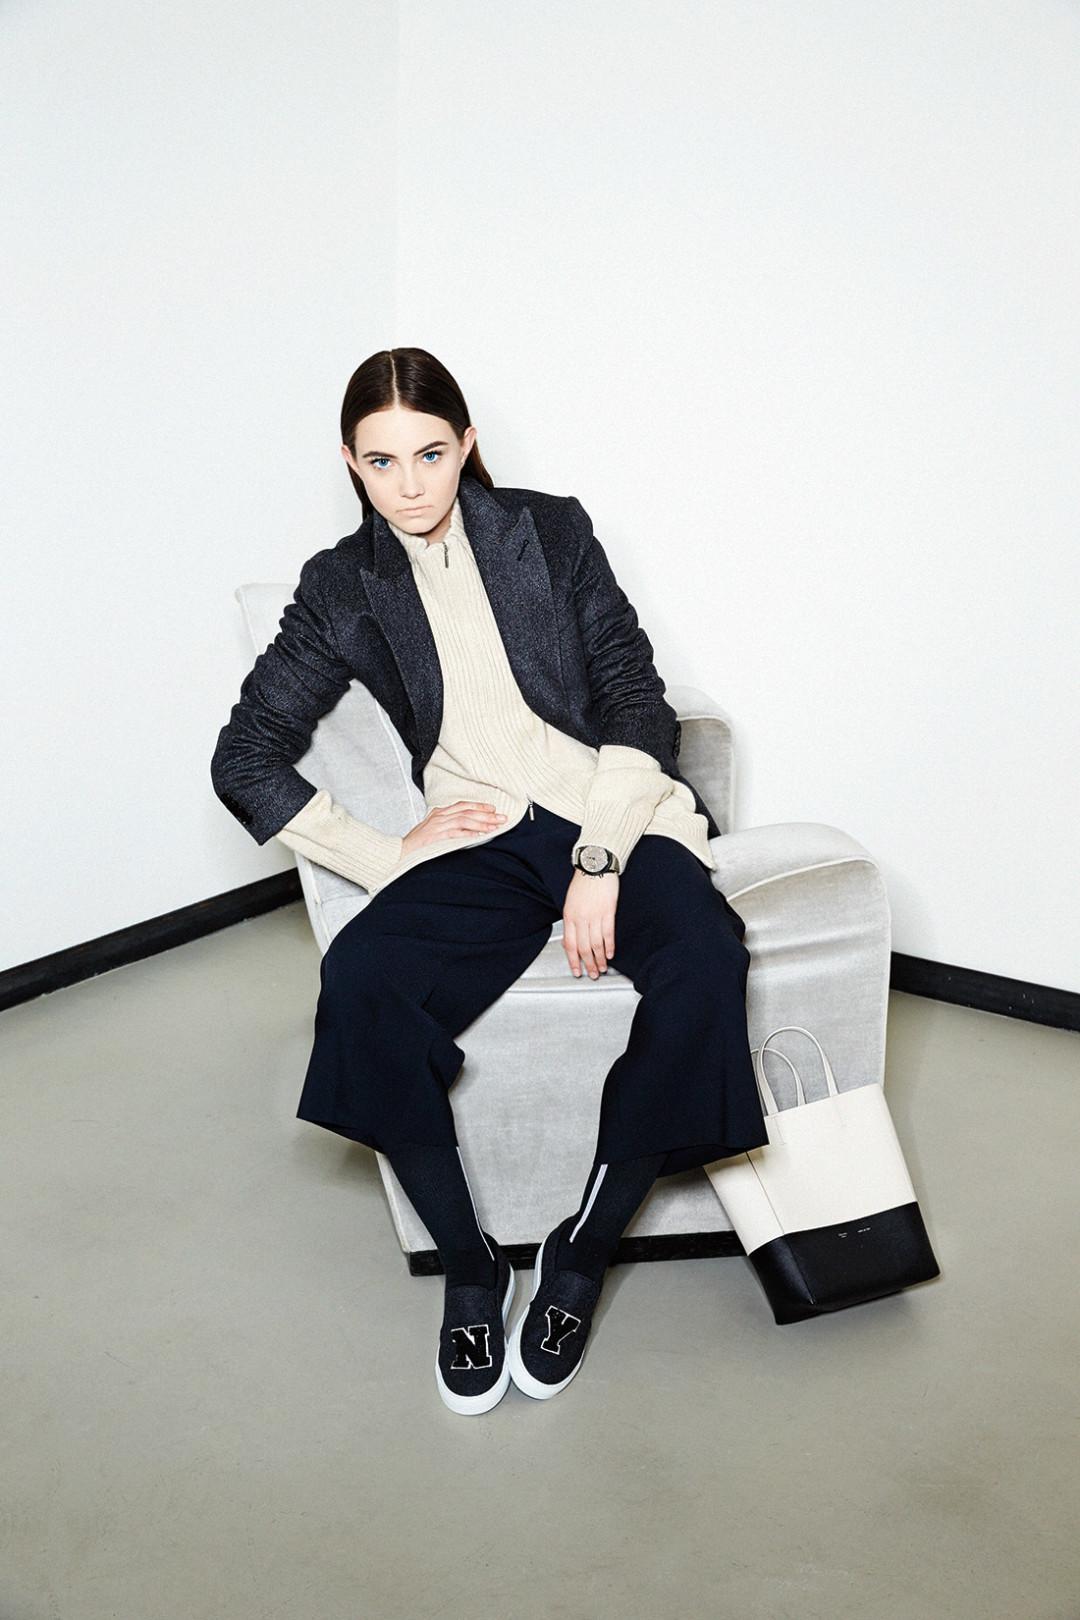 0215 plain spoken black jacket cream sweater zcf98p